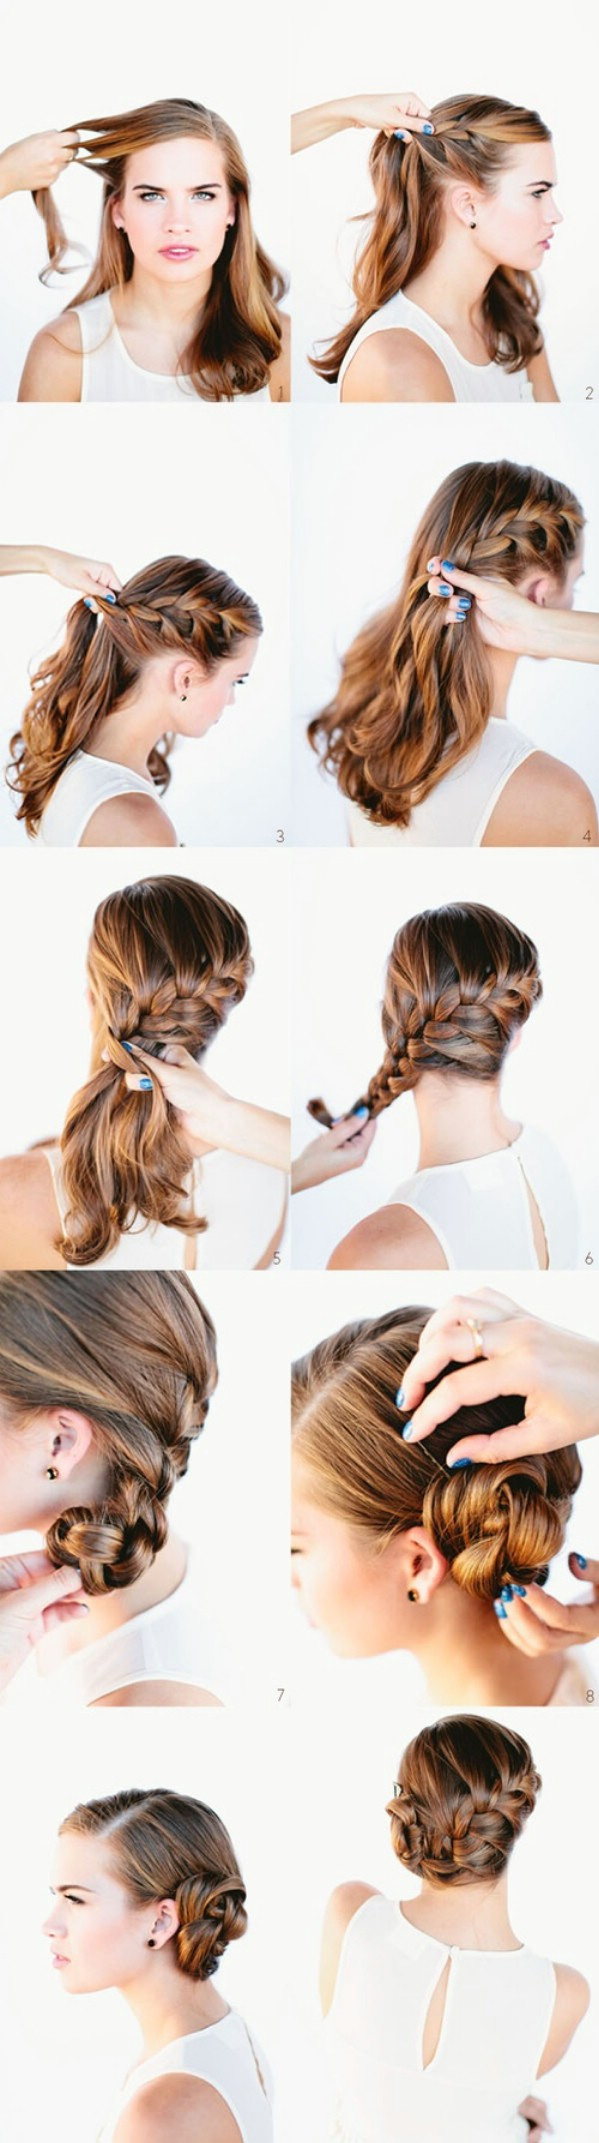 French braid into a bun step by step tutorial